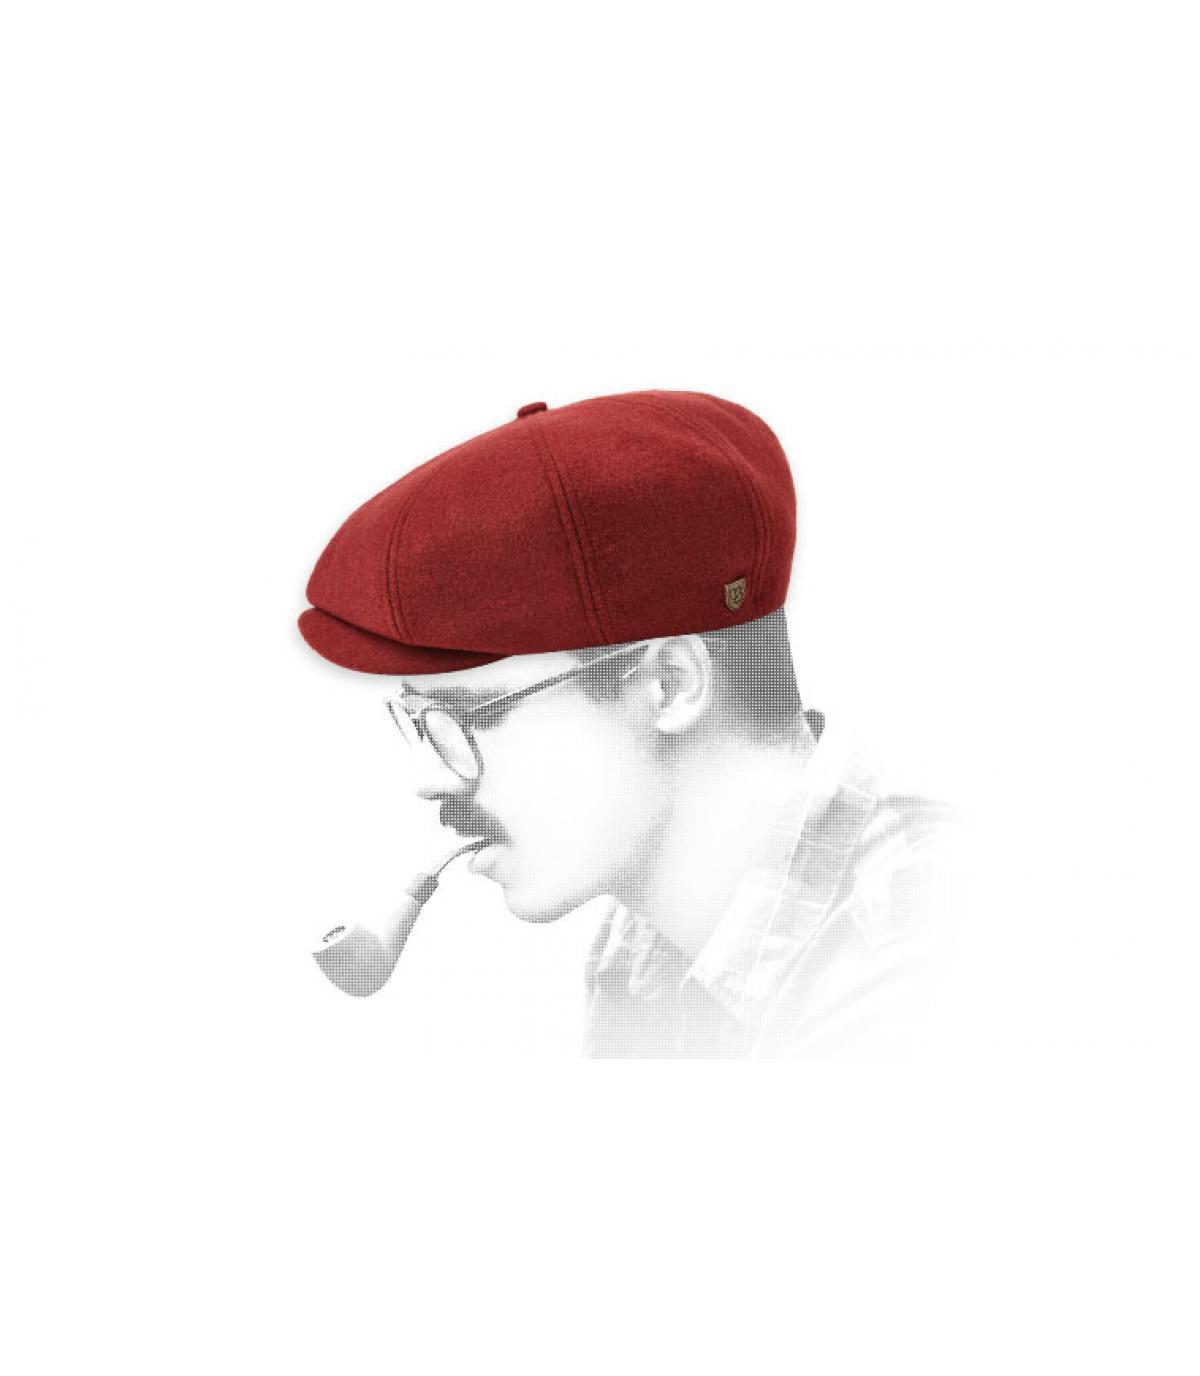 gorra repartidor granate